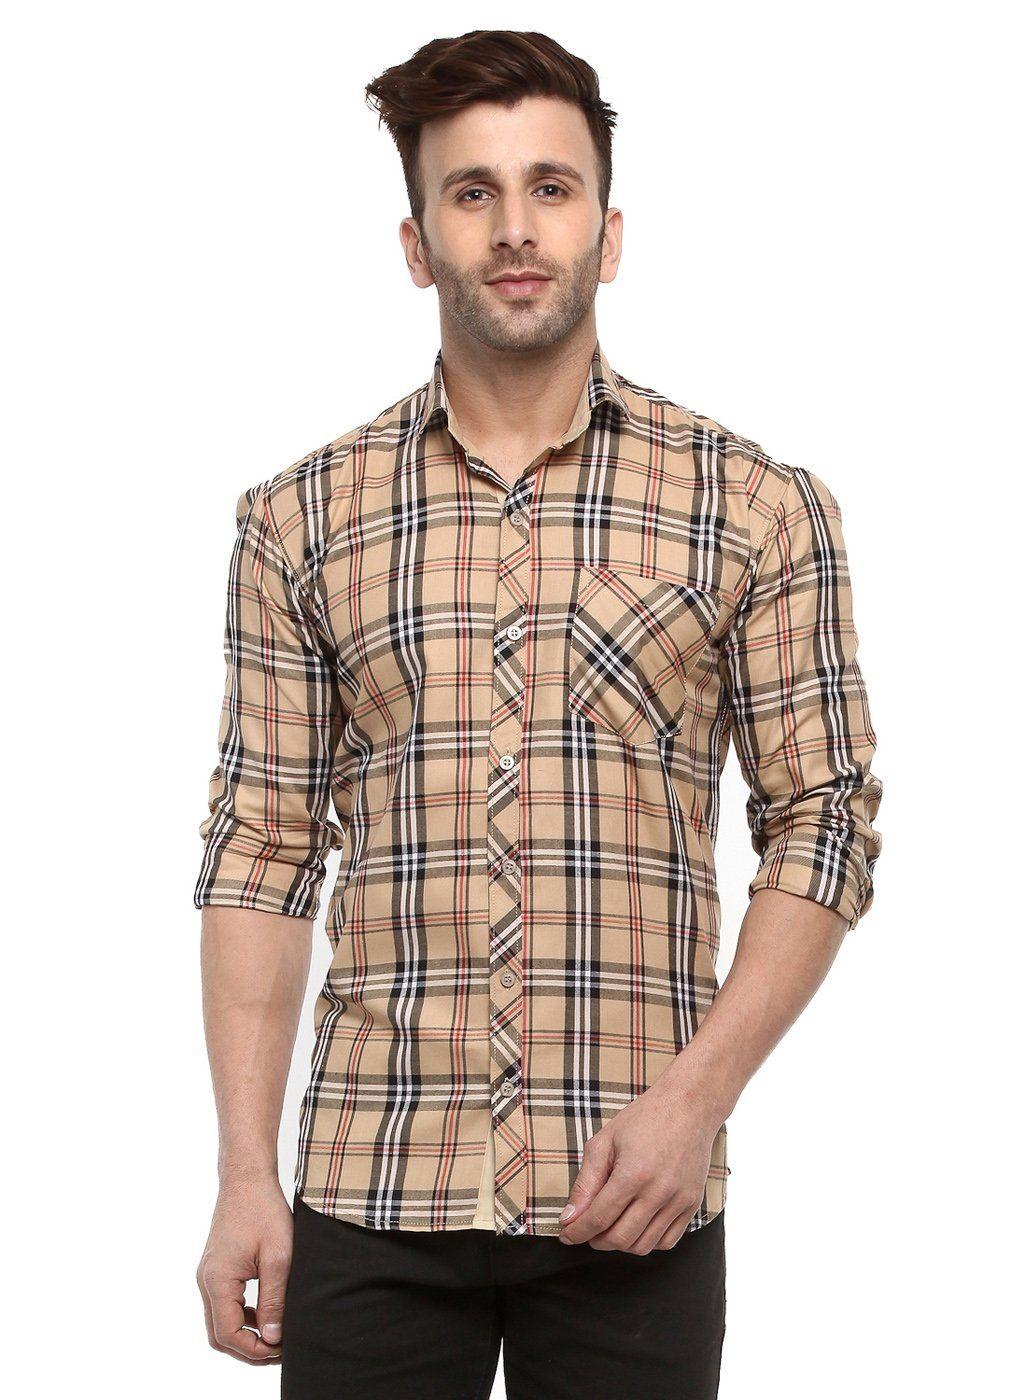 Buy Hangup Cream men shirt Online at Low prices in India